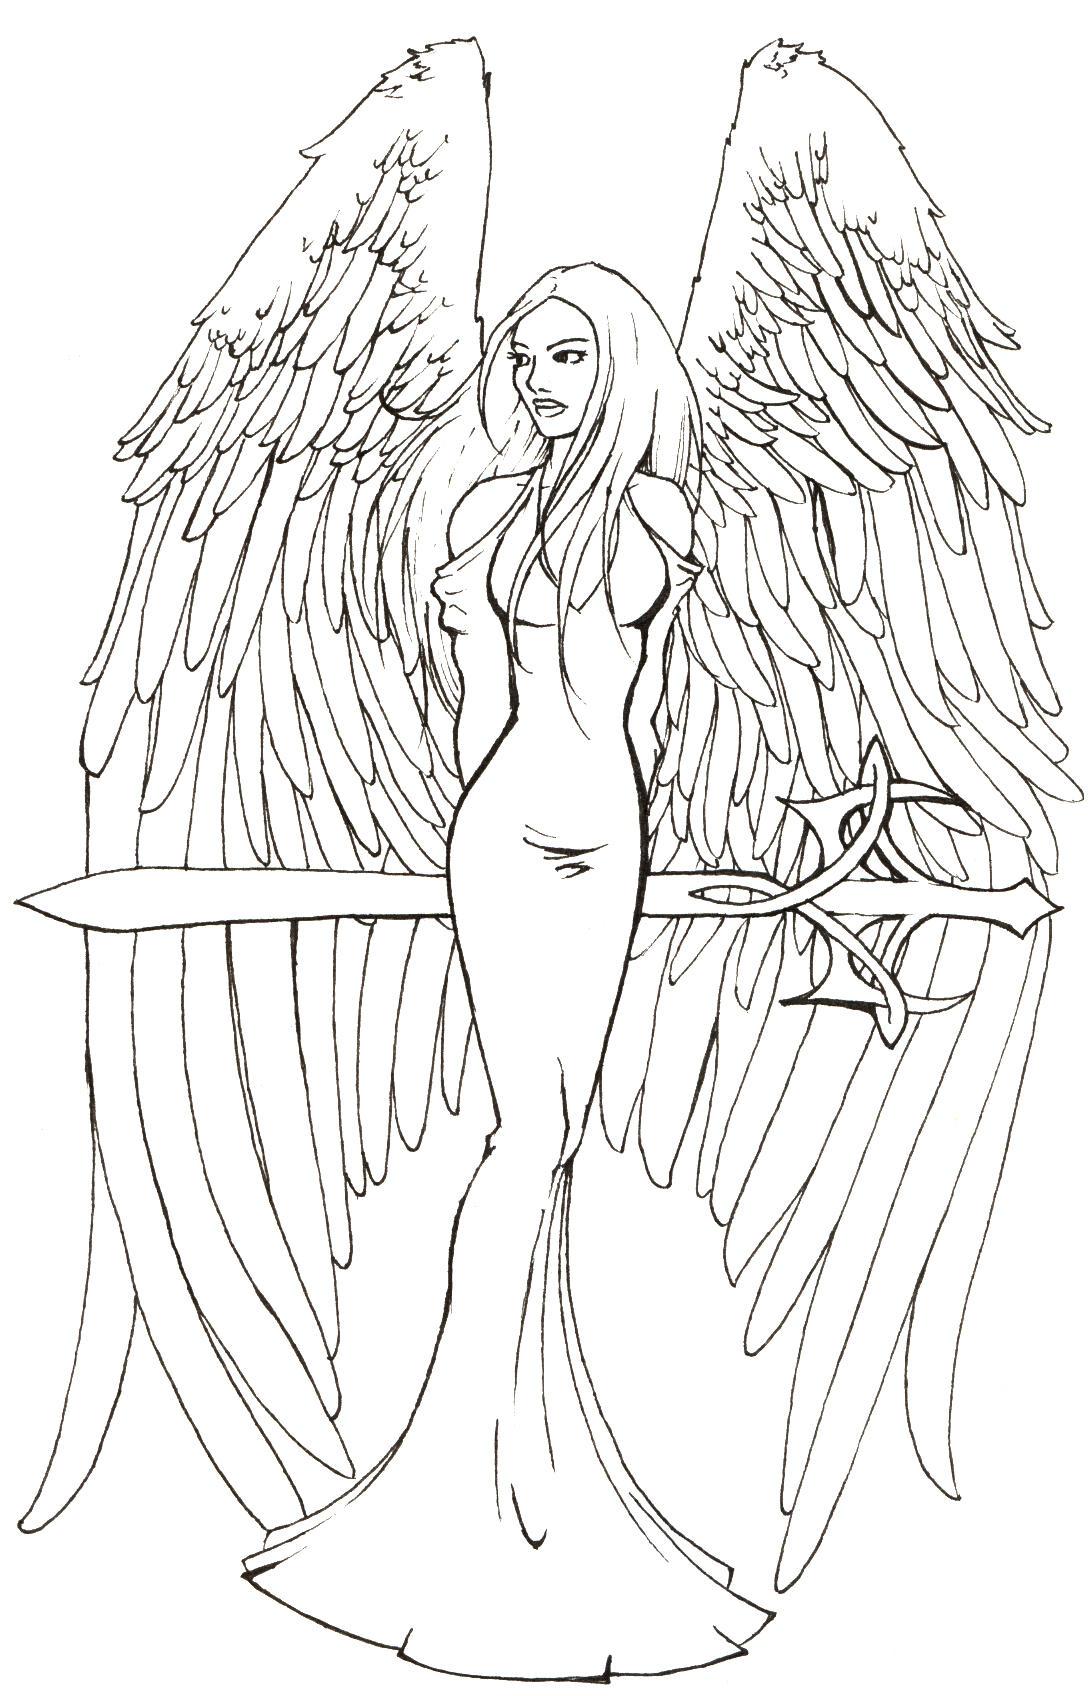 Line Art Angel : Sword angel lineart by dm dragonfyre on deviantart